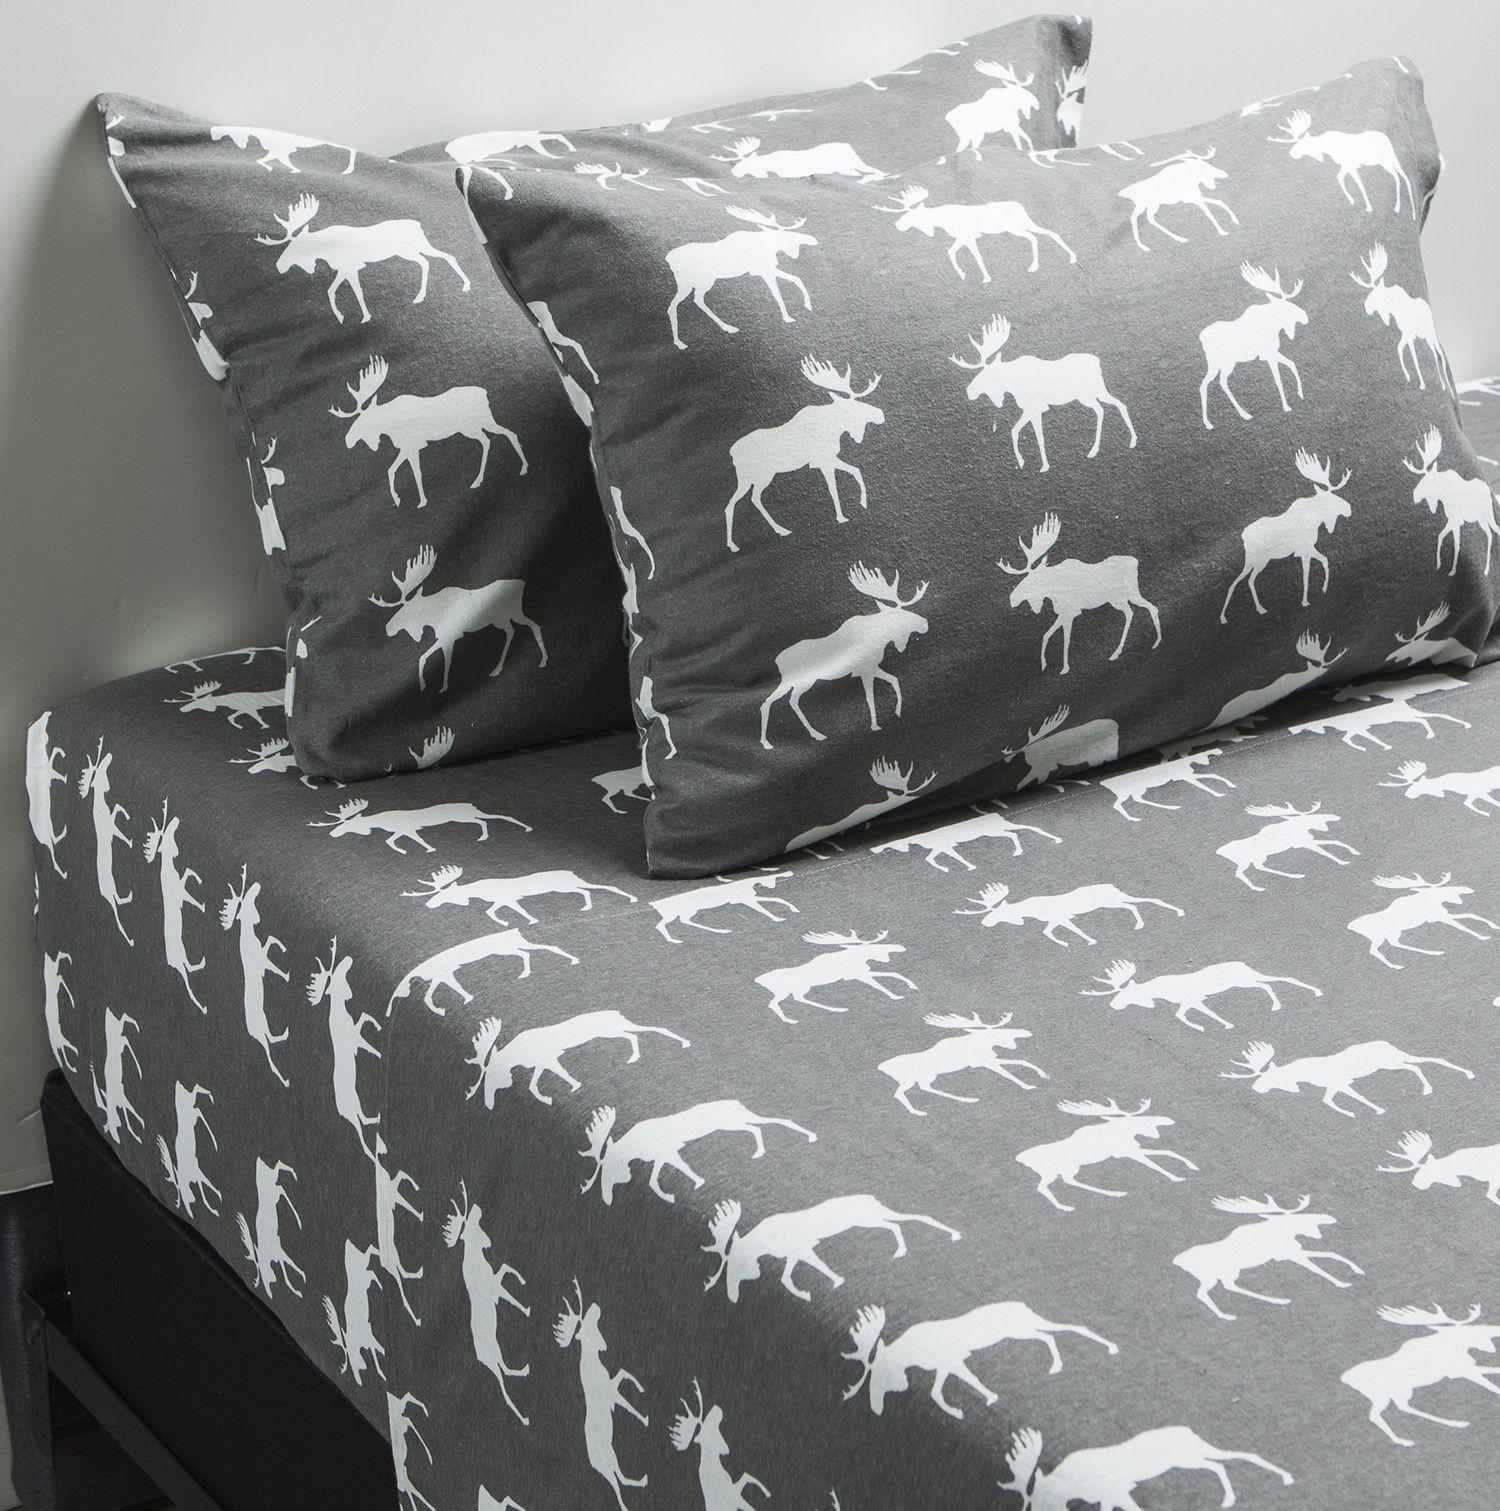 PRINTED FLANNEL Sheet Set Grey Moose Sheets Bedding